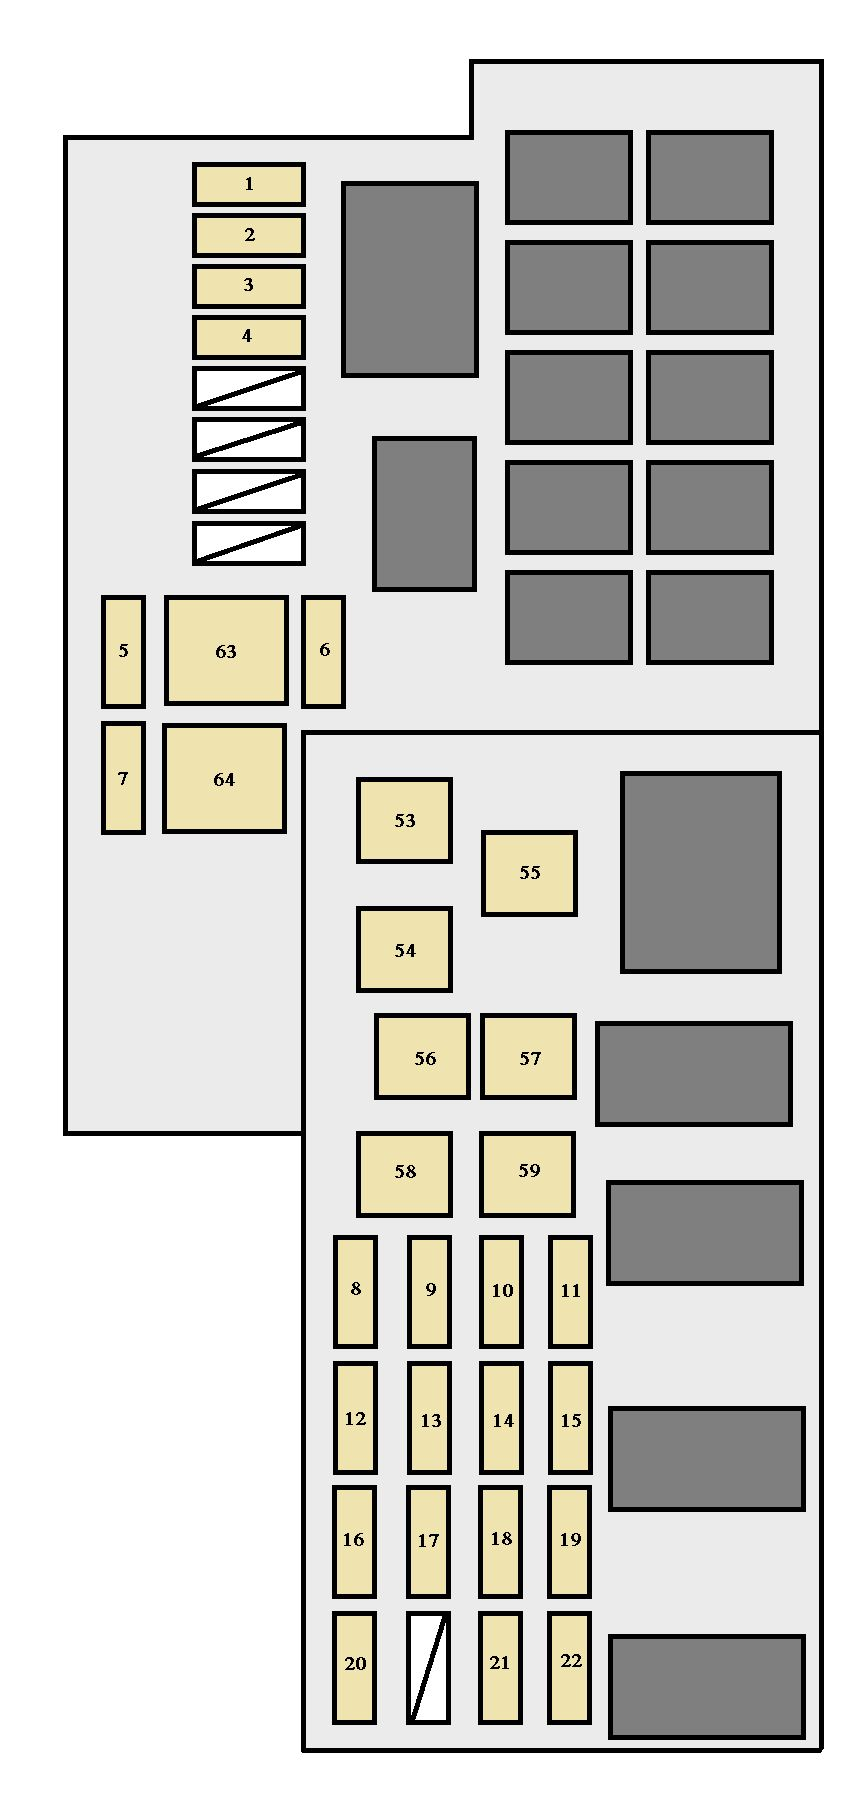 2002 toyota camry fuse box schematic diagram data2002 camry fuse box wiring diagram schema 2002 toyota camry fuse box layout 2002 toyota camry fuse box